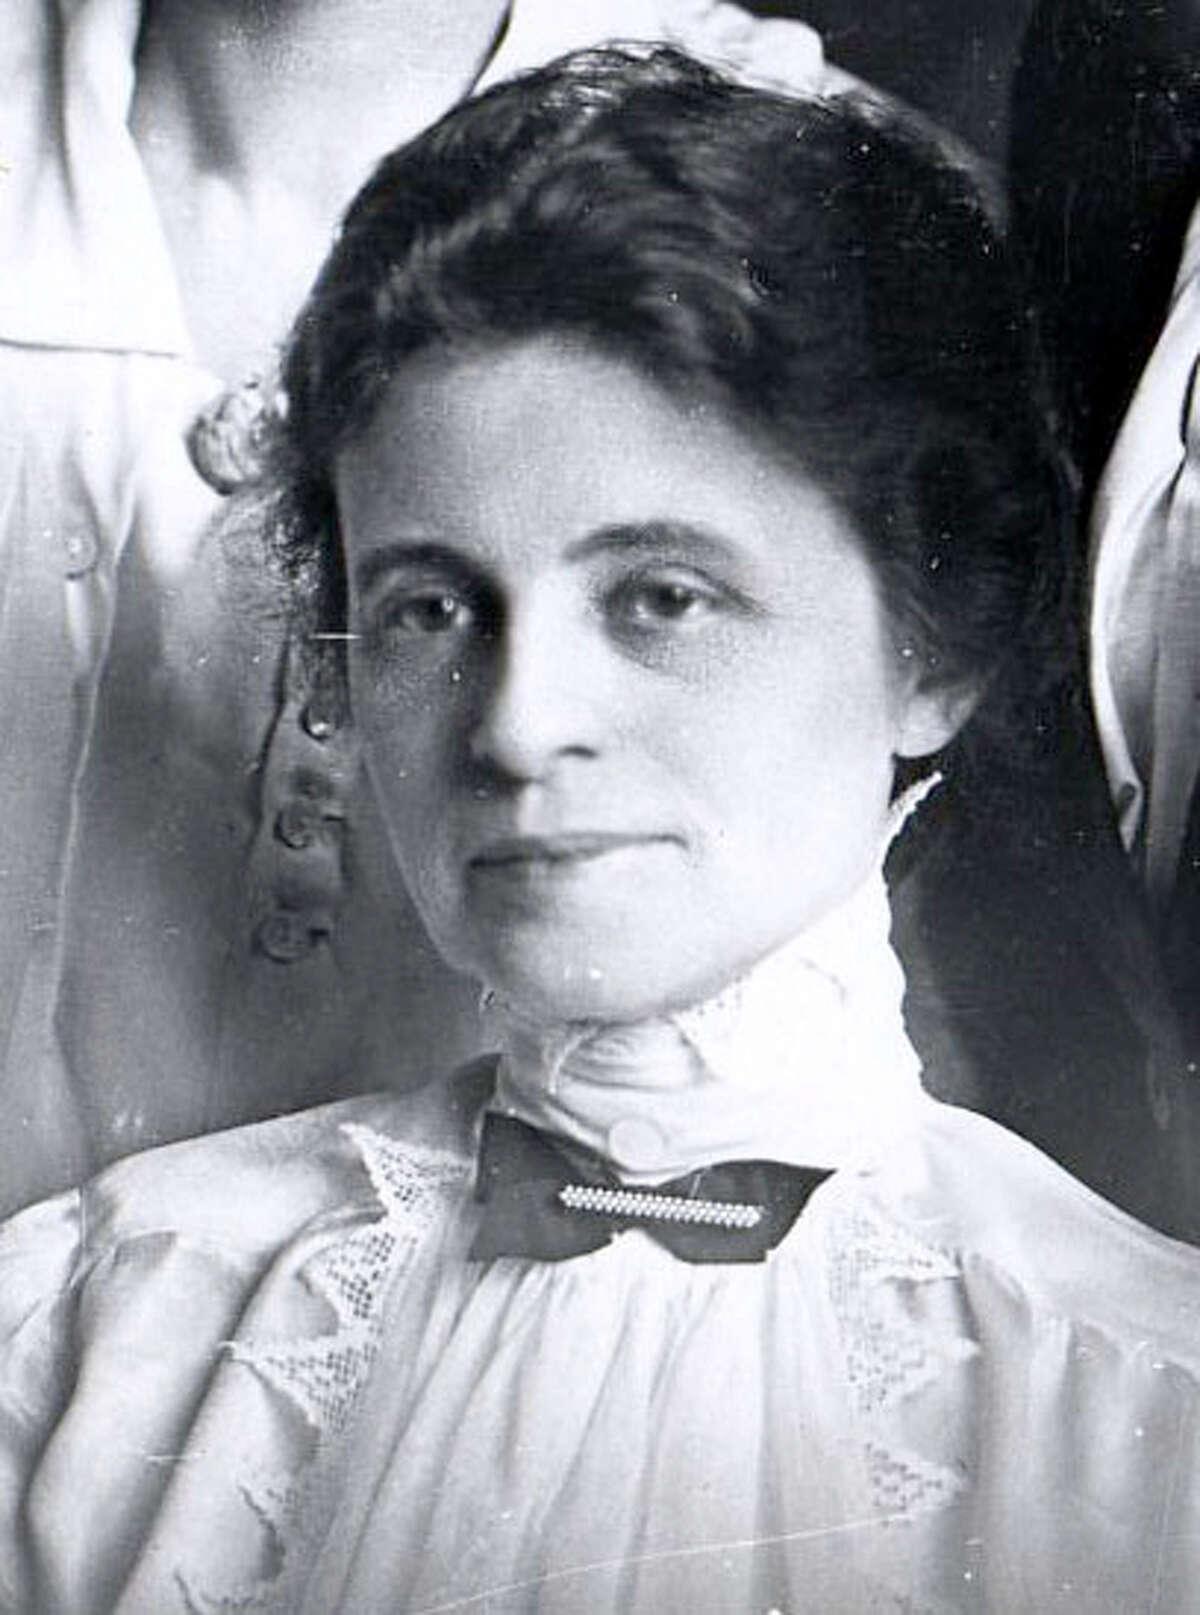 Belle Nye, the former Mrs. John Canfield.